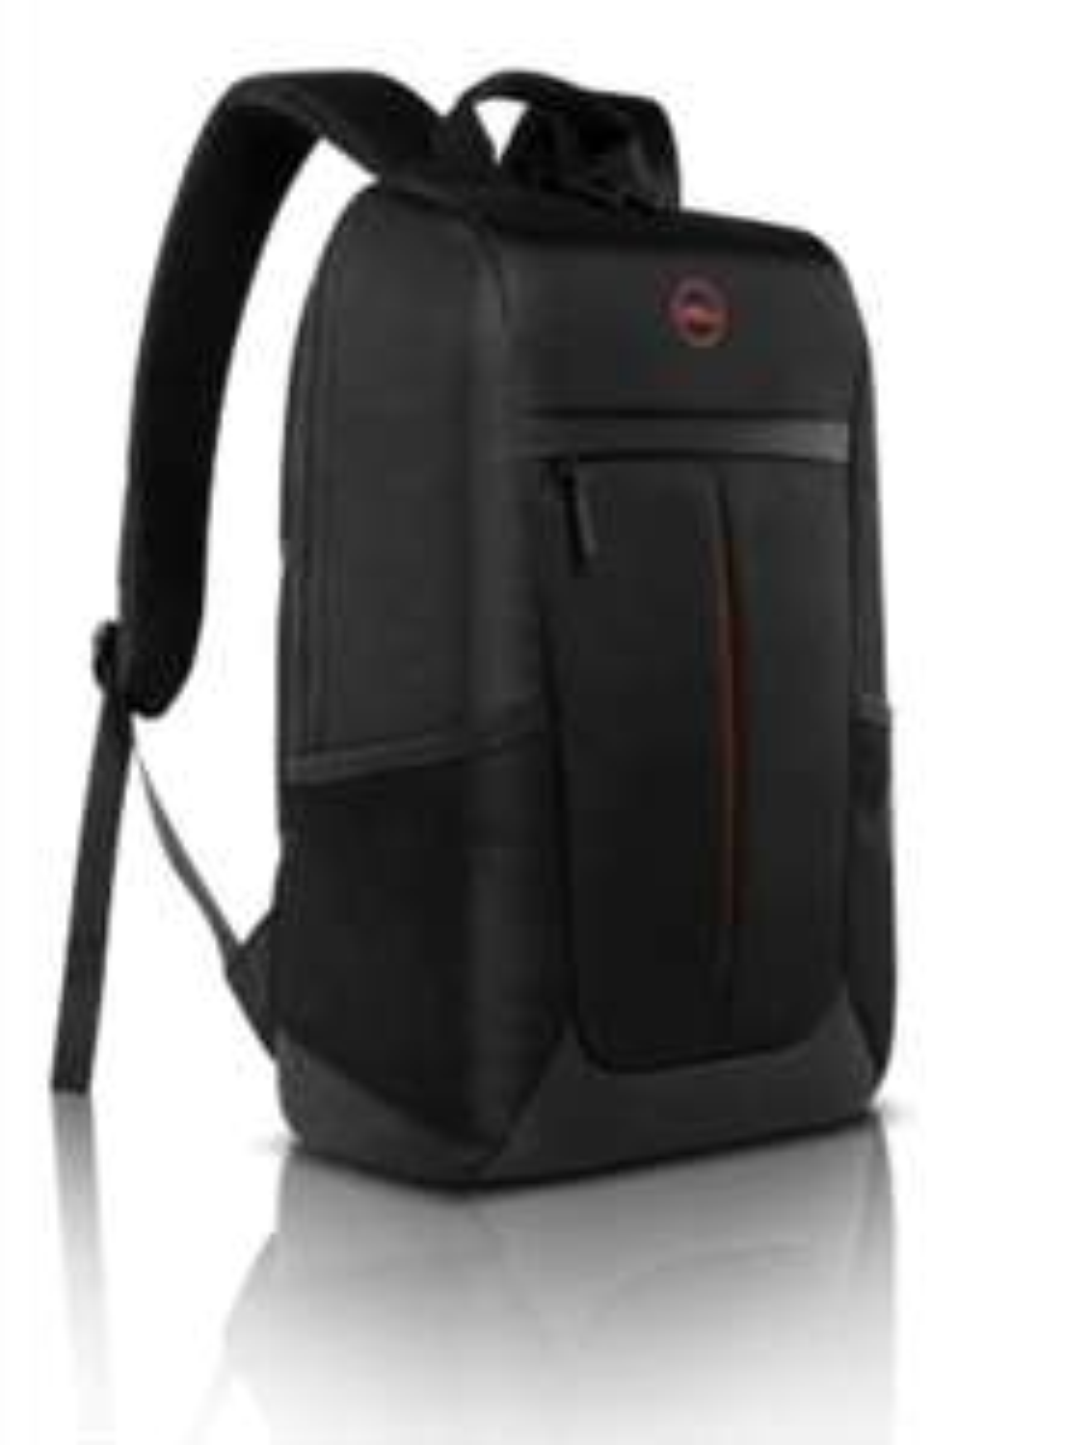 Dell Gaming Lite Backpack 17 - £20.56 delivered at Dell